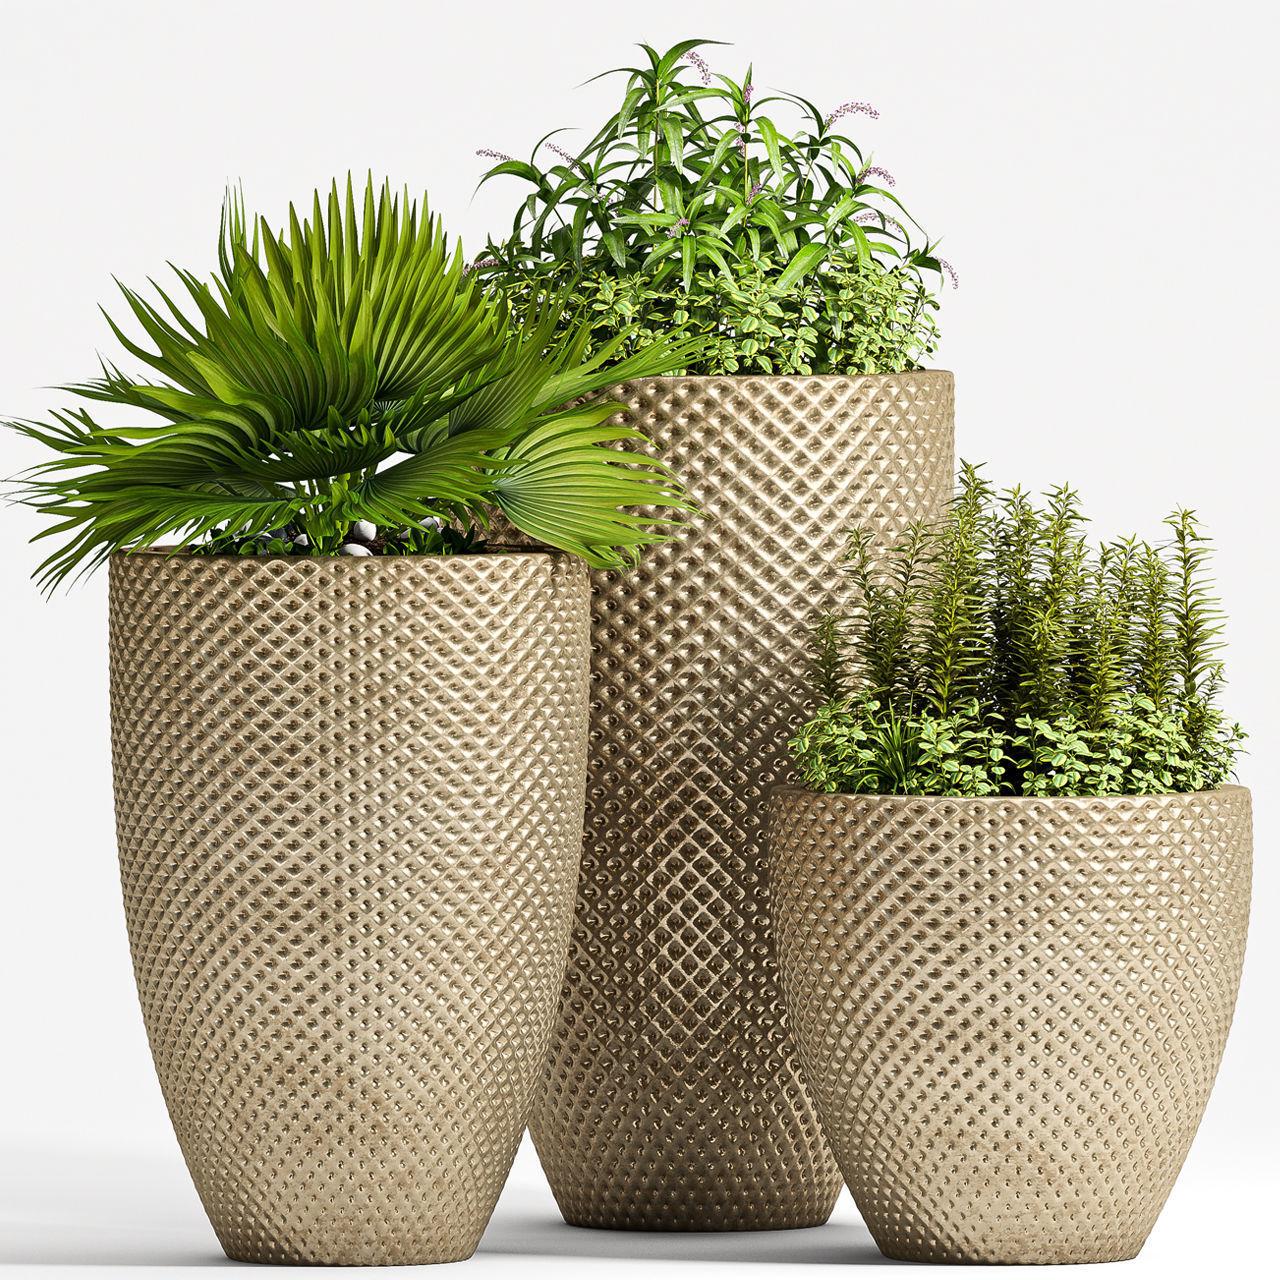 Decorative plant set-62